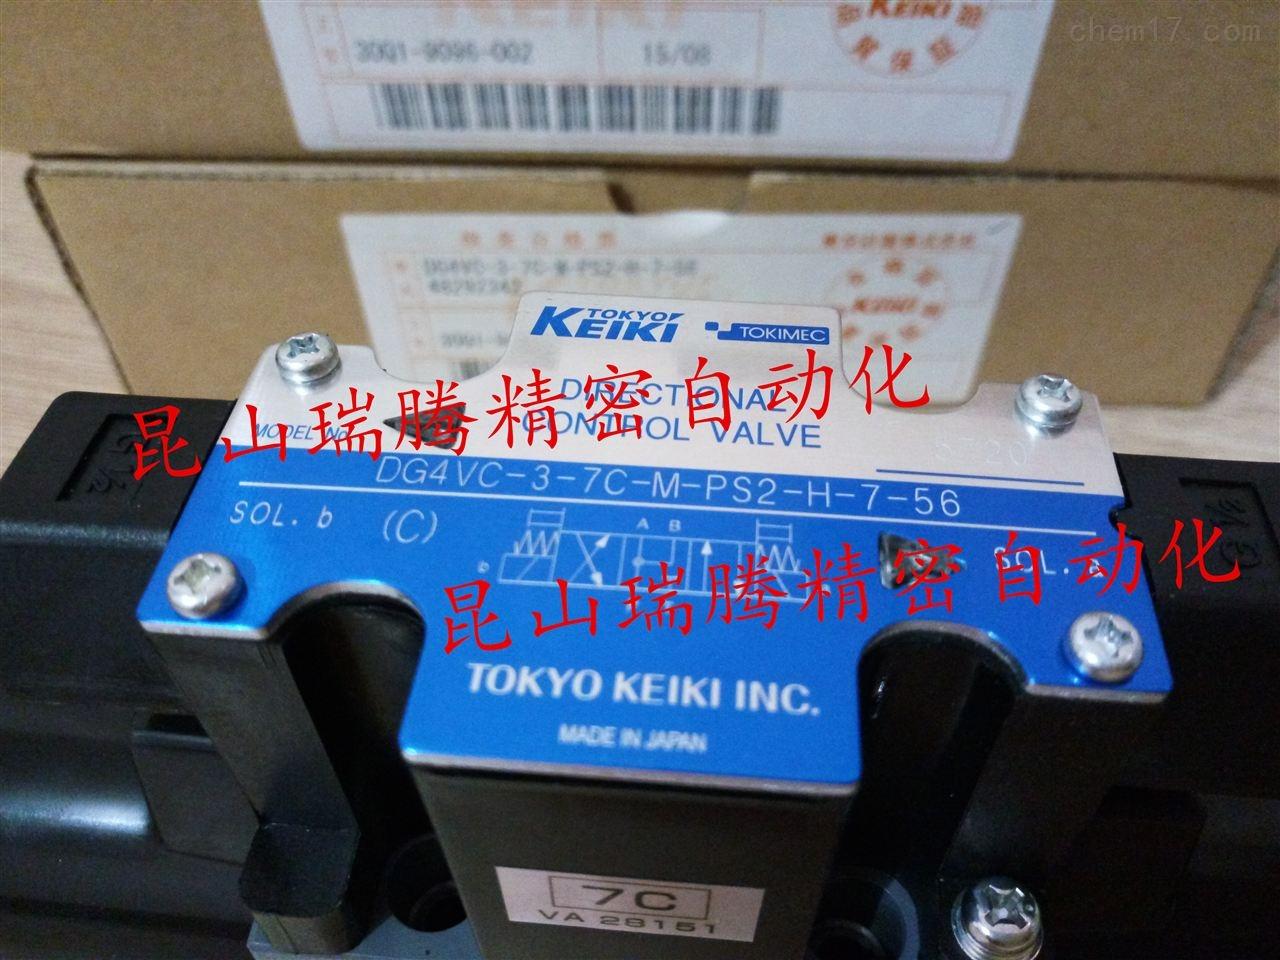 TokyoKeiki电磁阀DG4VC-3-7C-M-PS2-H-7-56